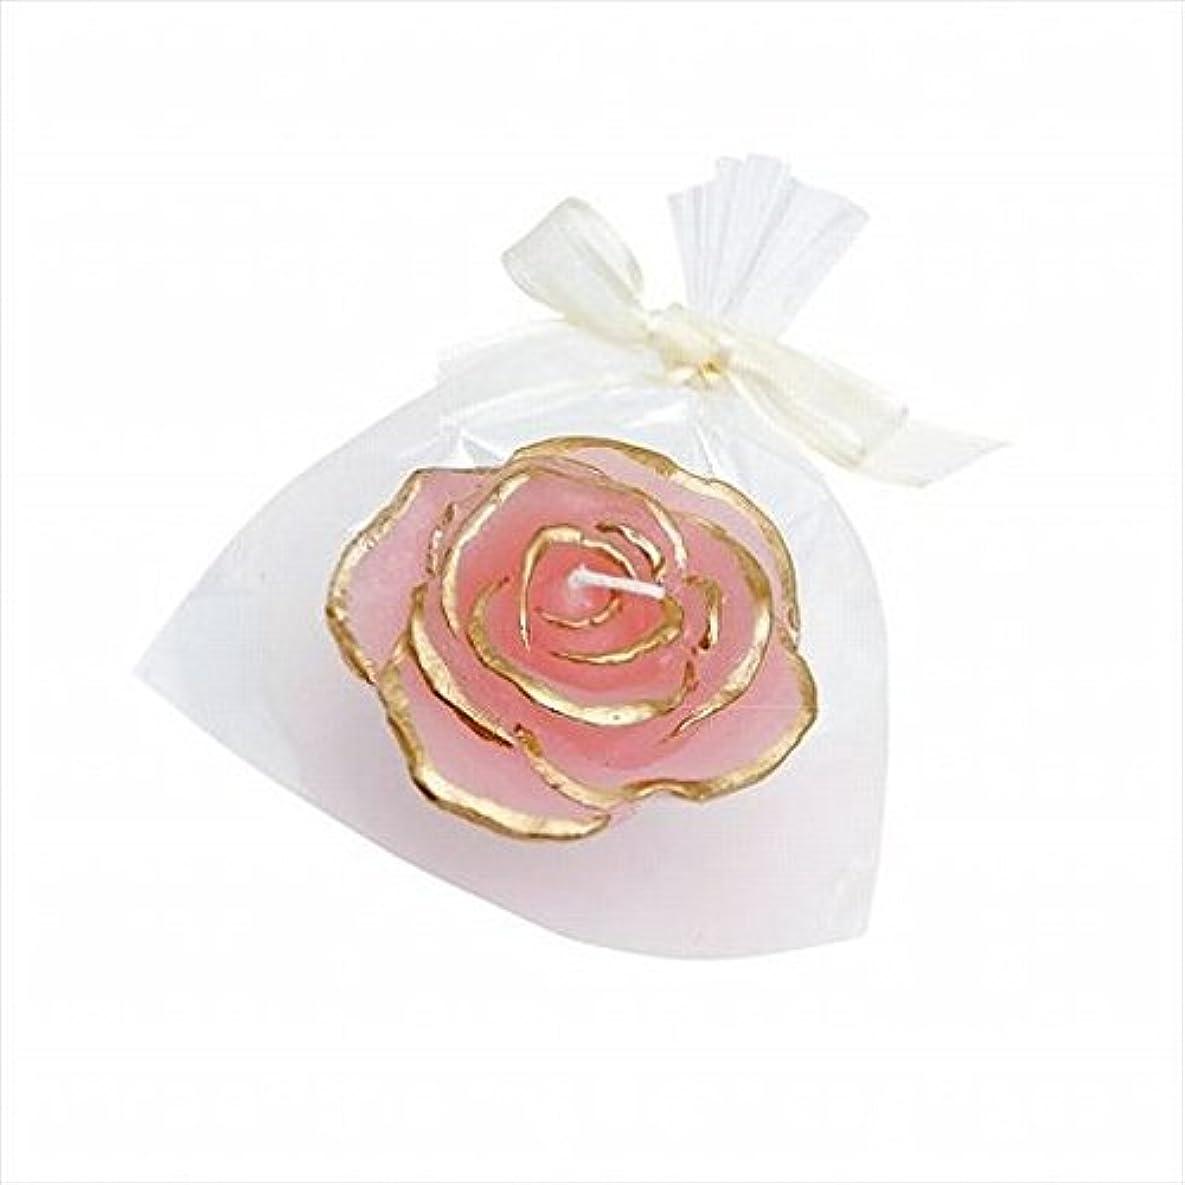 kameyama candle(カメヤマキャンドル) プリンセスローズ 「 ピンク 」(A6390500PK)